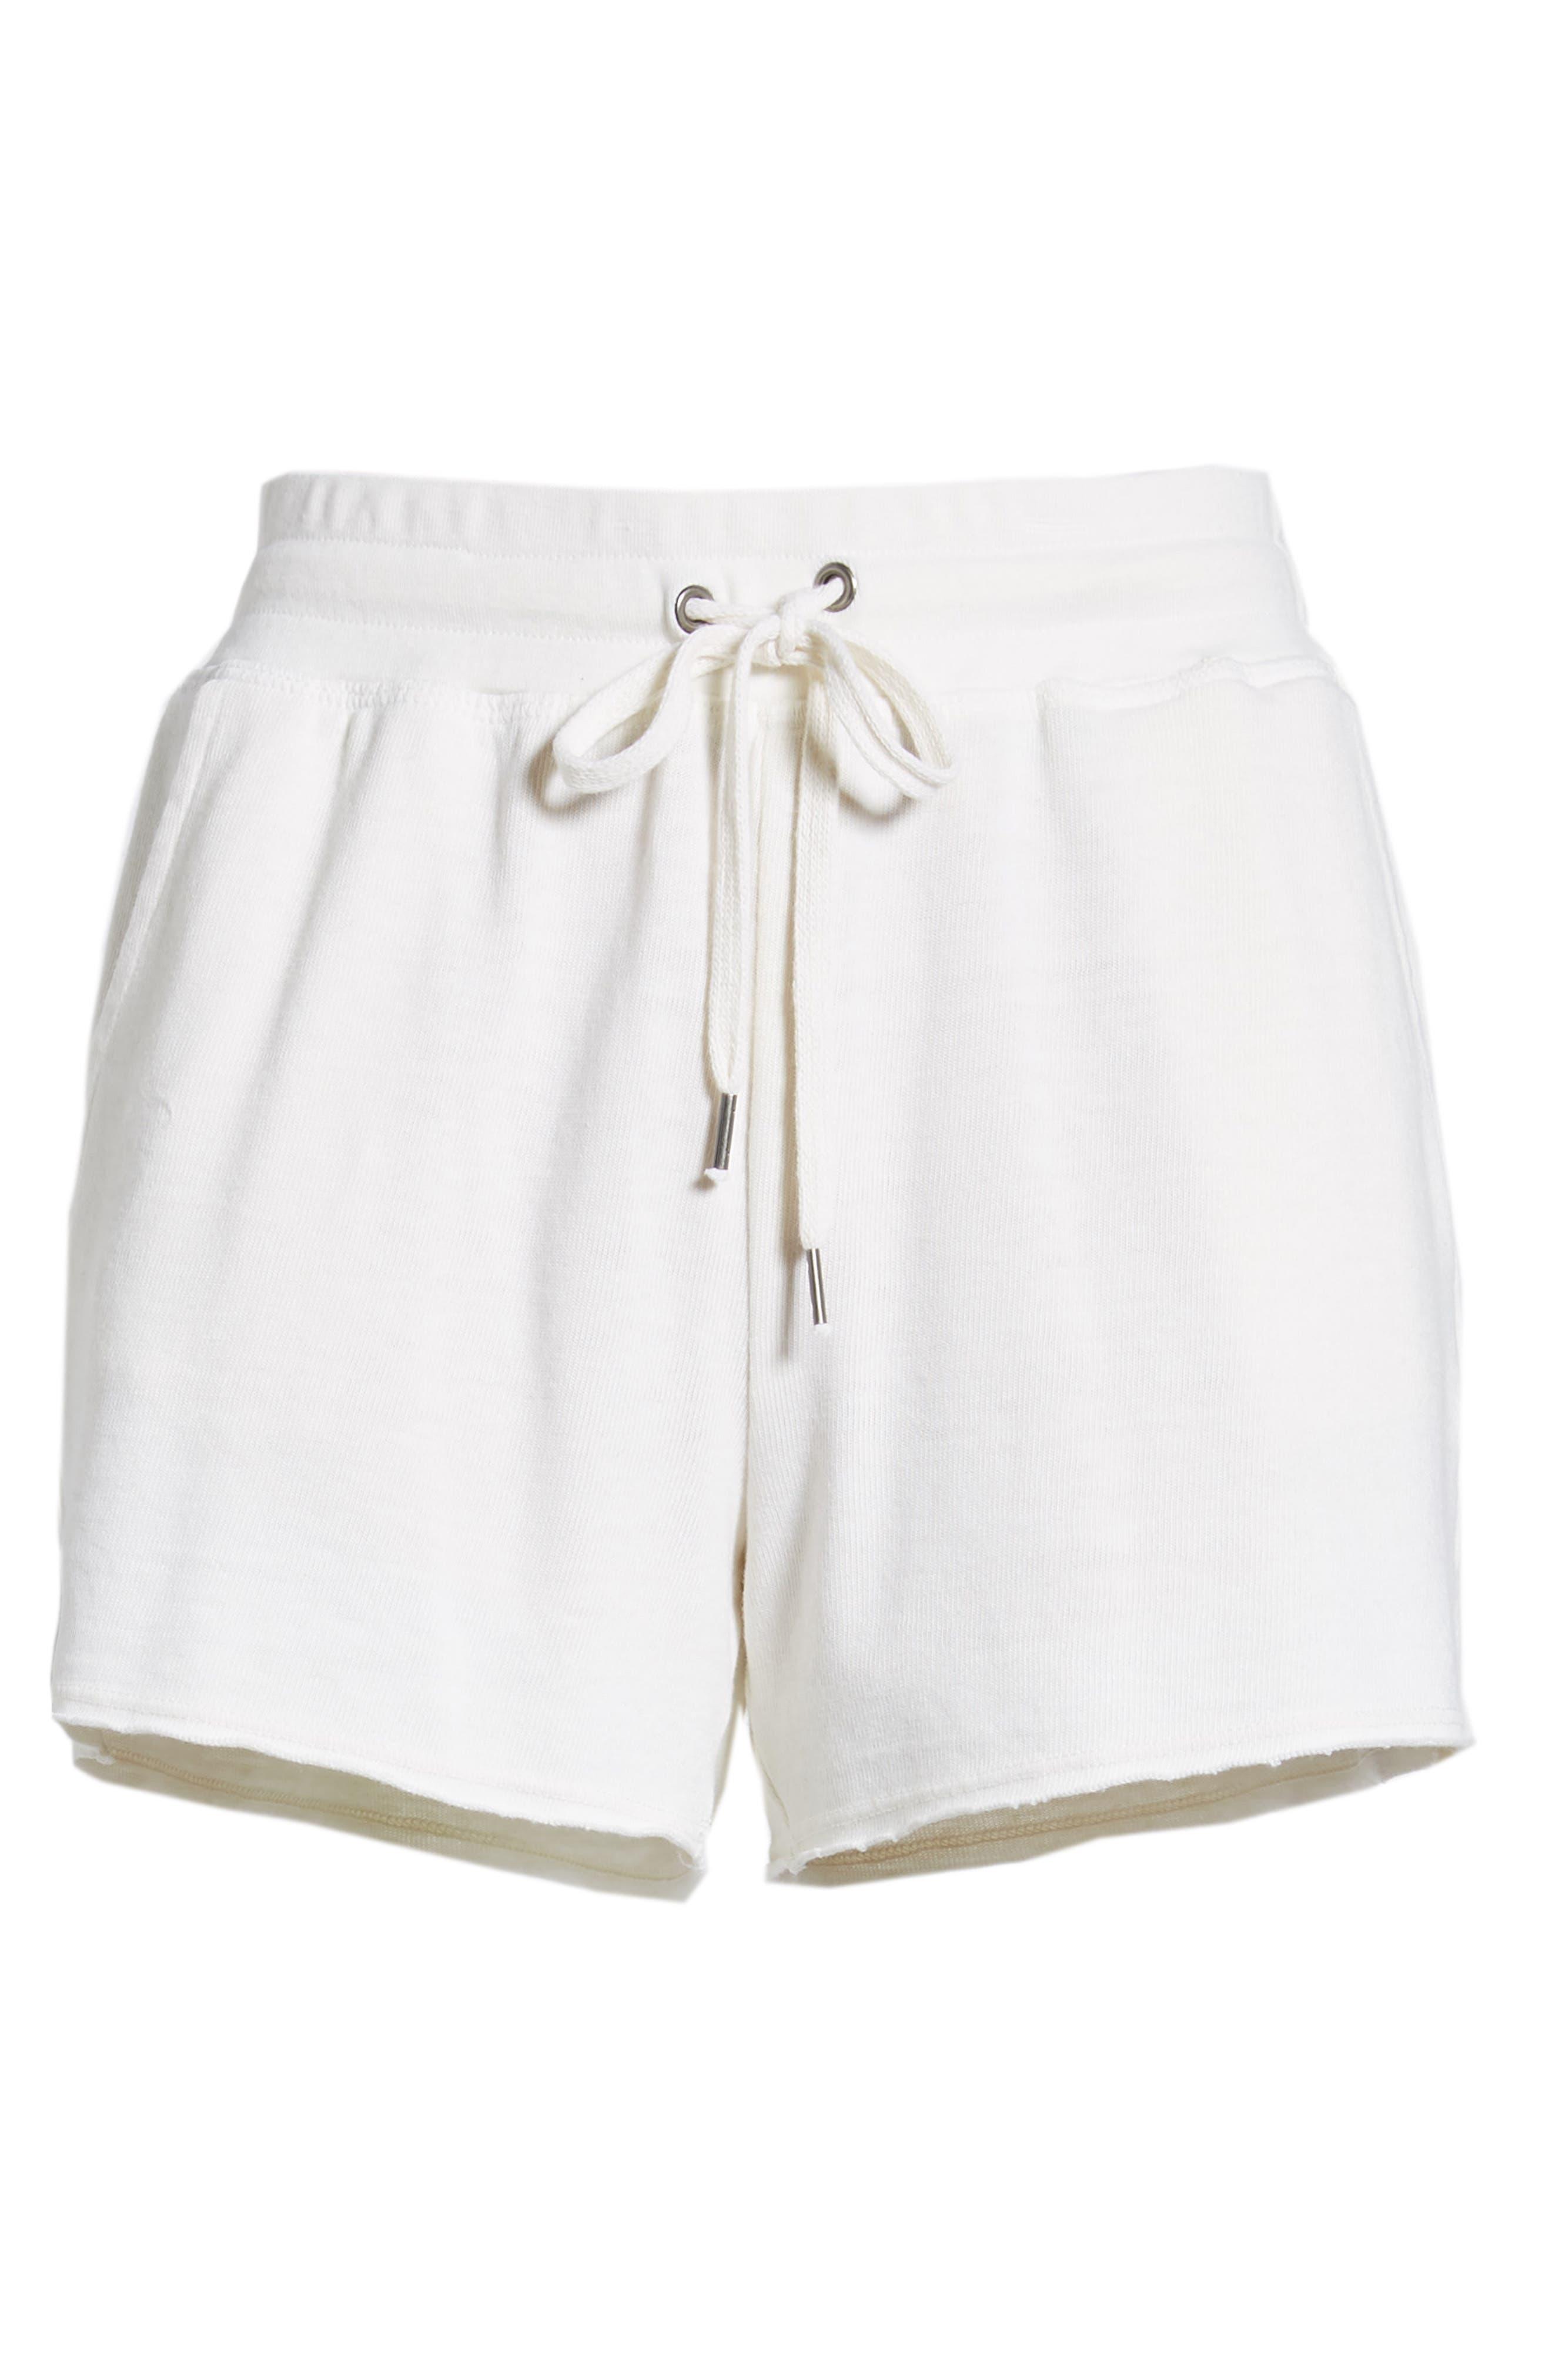 Active Shorts,                             Main thumbnail 1, color,                             Off White